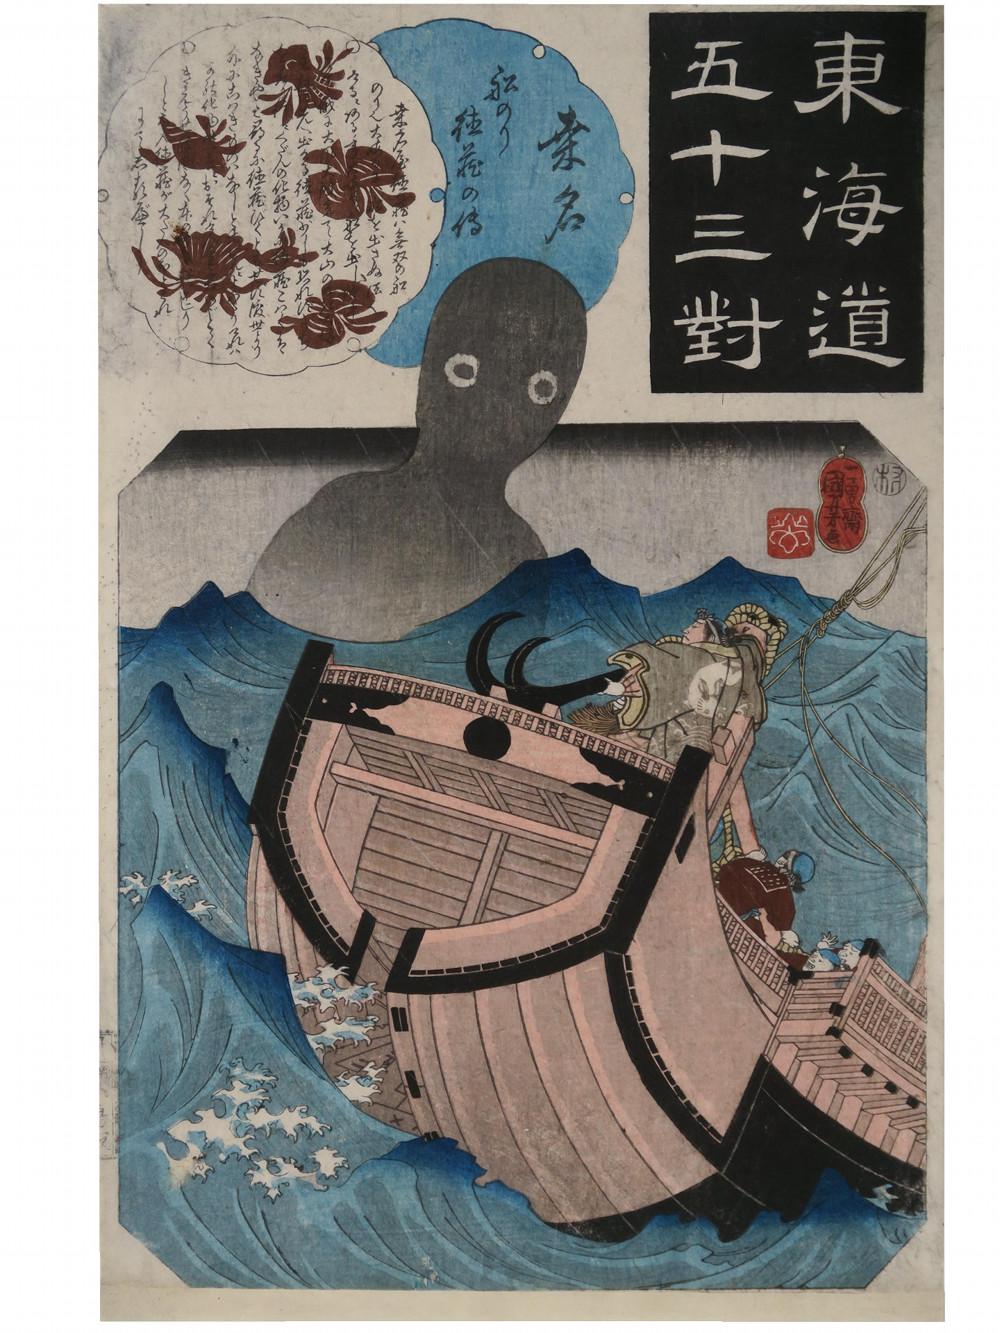 antiquit tenmesse 93 kunst antiquit ten m nchen 2016. Black Bedroom Furniture Sets. Home Design Ideas